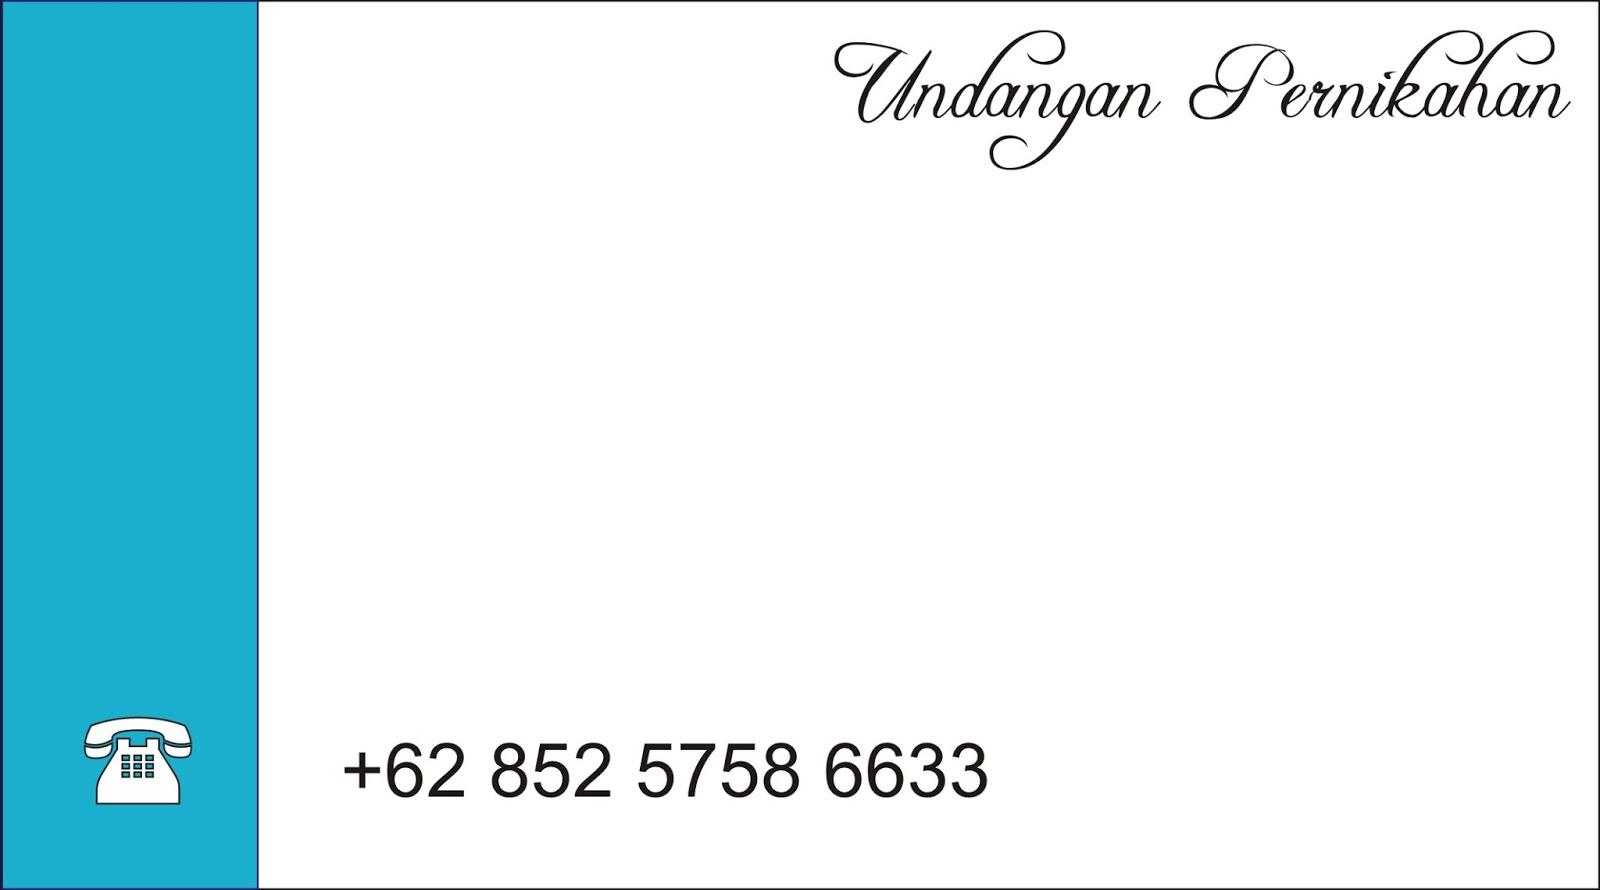 0852 5758 6633 Kartu Undangan Pernikahan Unik Macam Souvenir Mahar